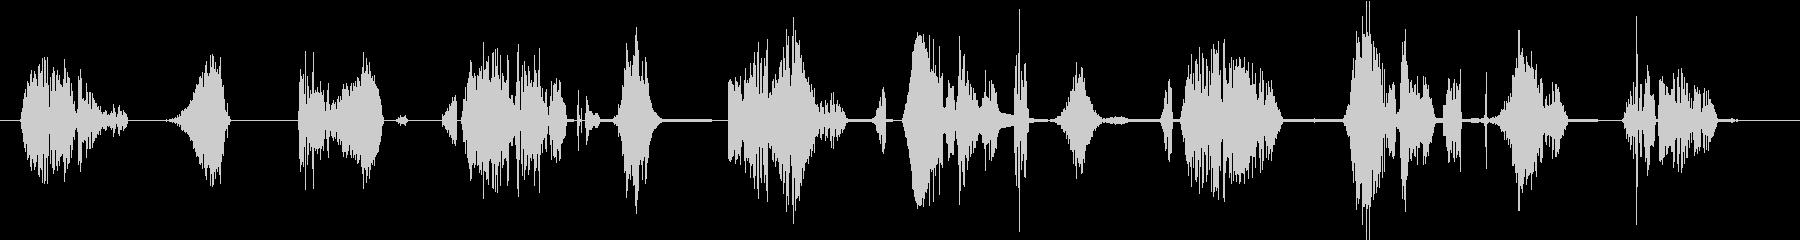 LaserSynth EC04_34_1の未再生の波形